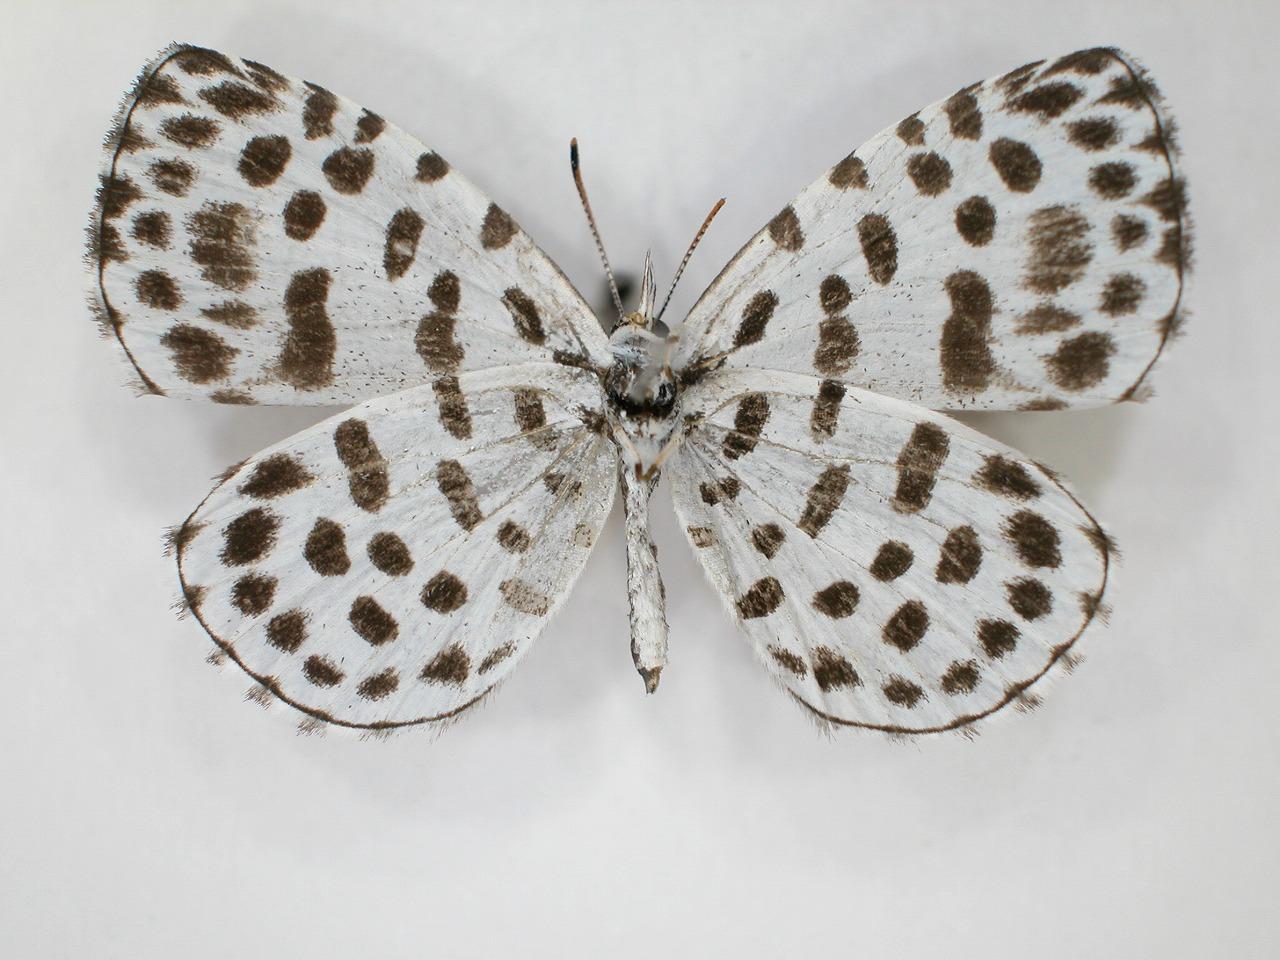 https://www.hitohaku.jp/material/l-material/butterfly-wing/5-lycaenidae/B1-638437_B.jpg